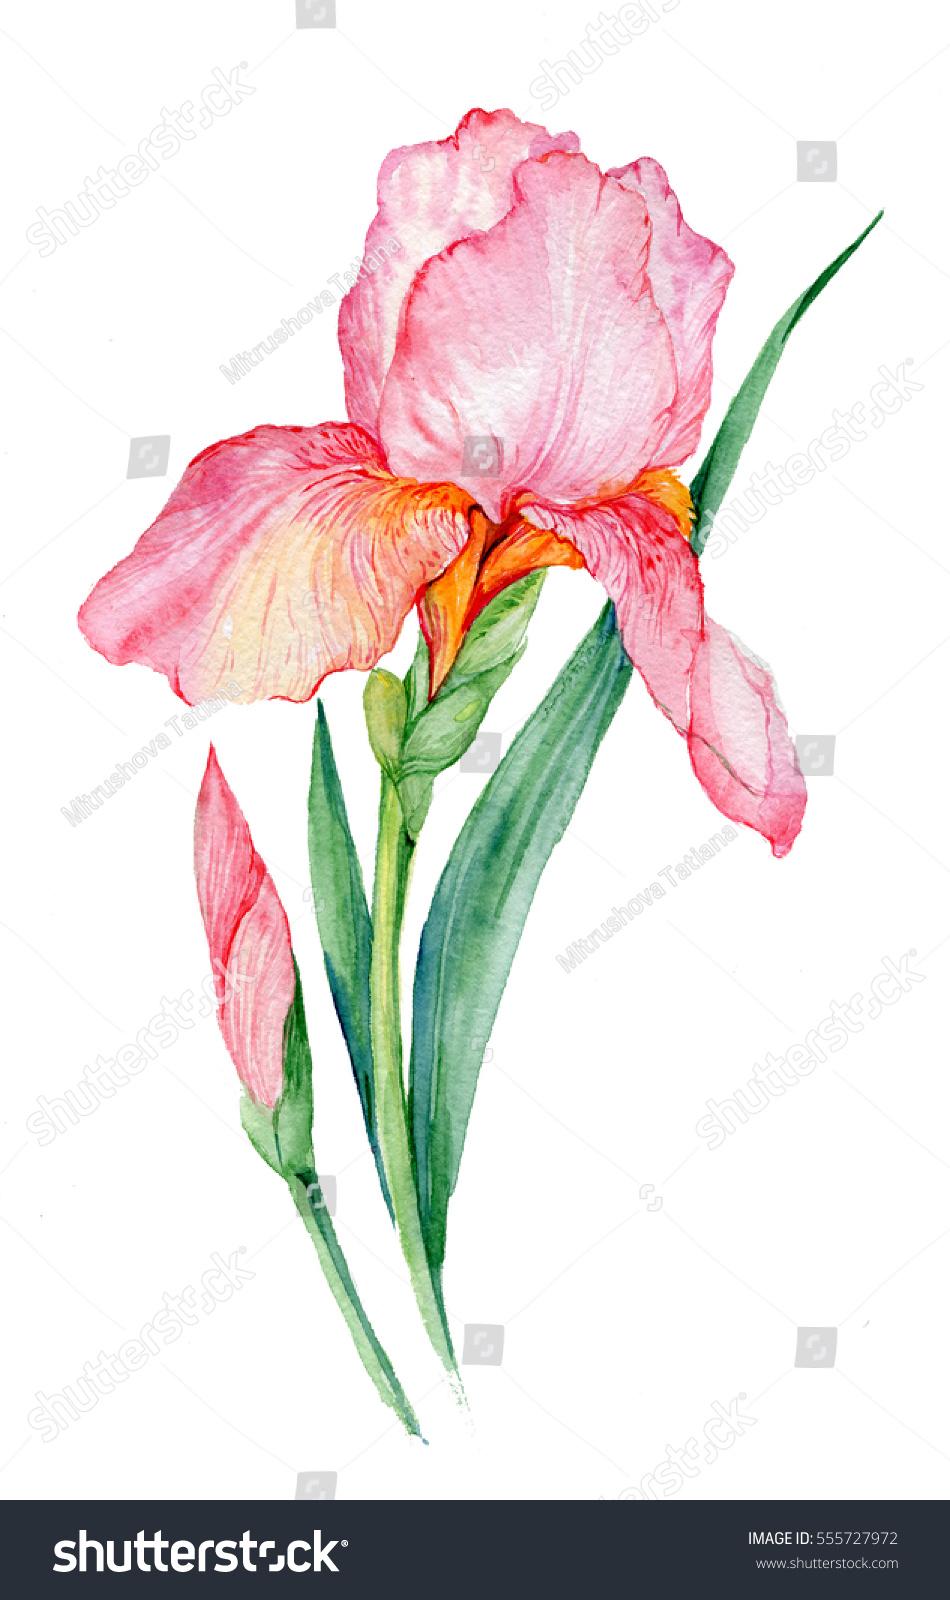 Royalty free stock illustration of pink iris illustration watercolor pink iris illustration watercolor iris flower isolated on white background izmirmasajfo